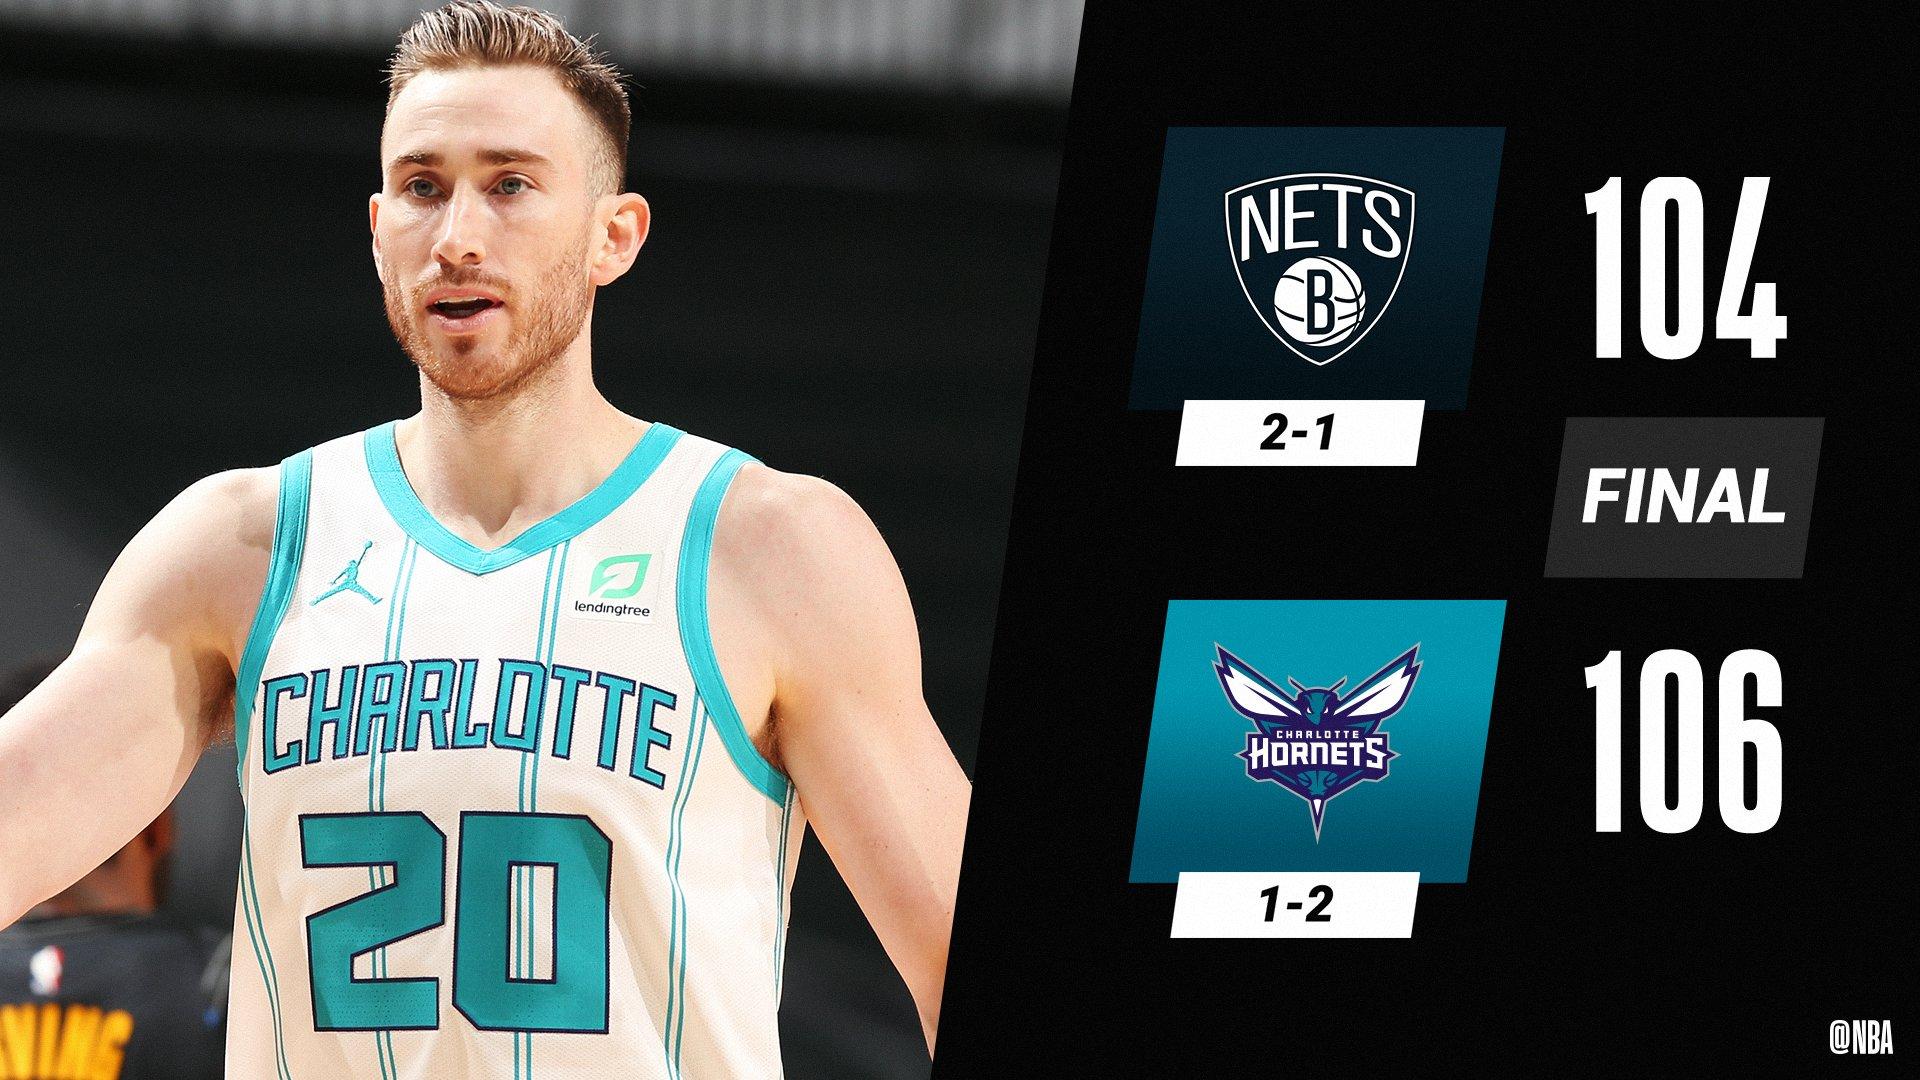 28-12-4